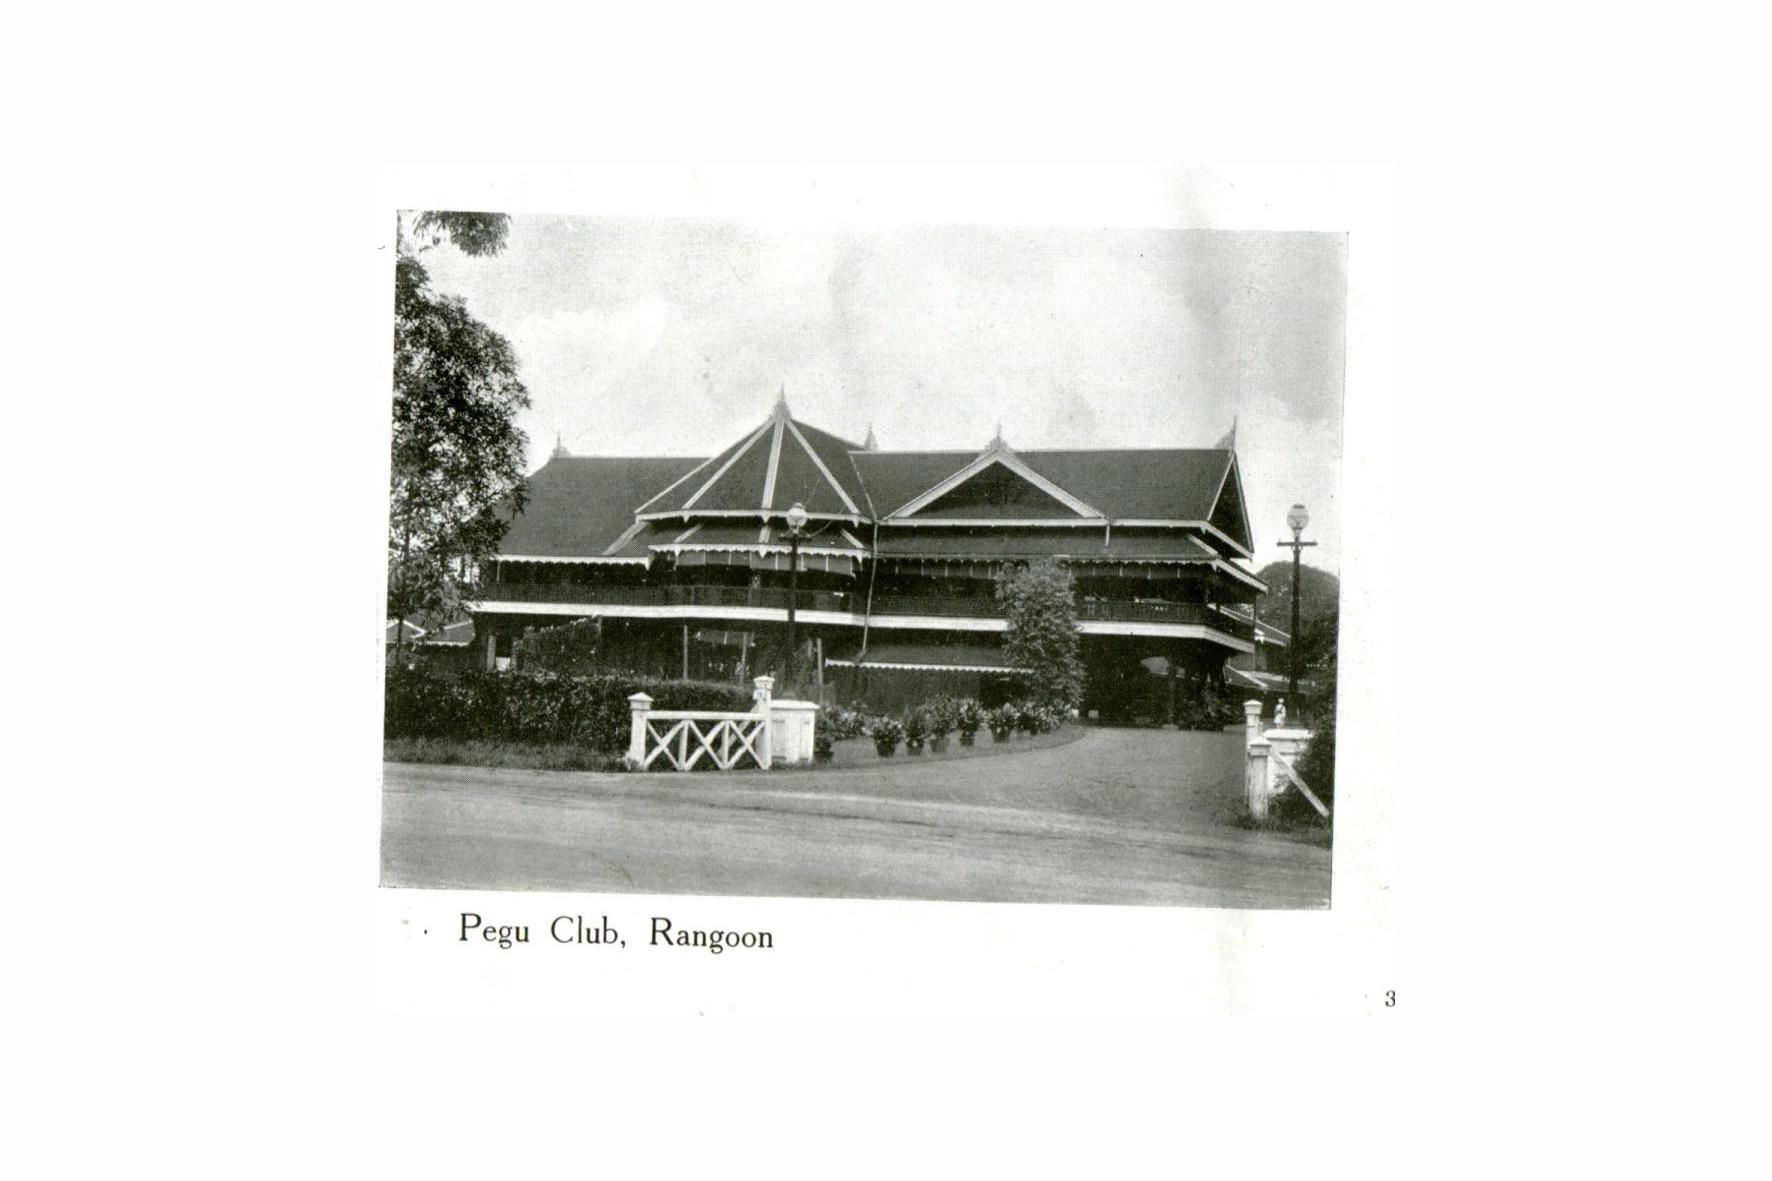 Pegu Club (Burma Typical Photographs).jpg